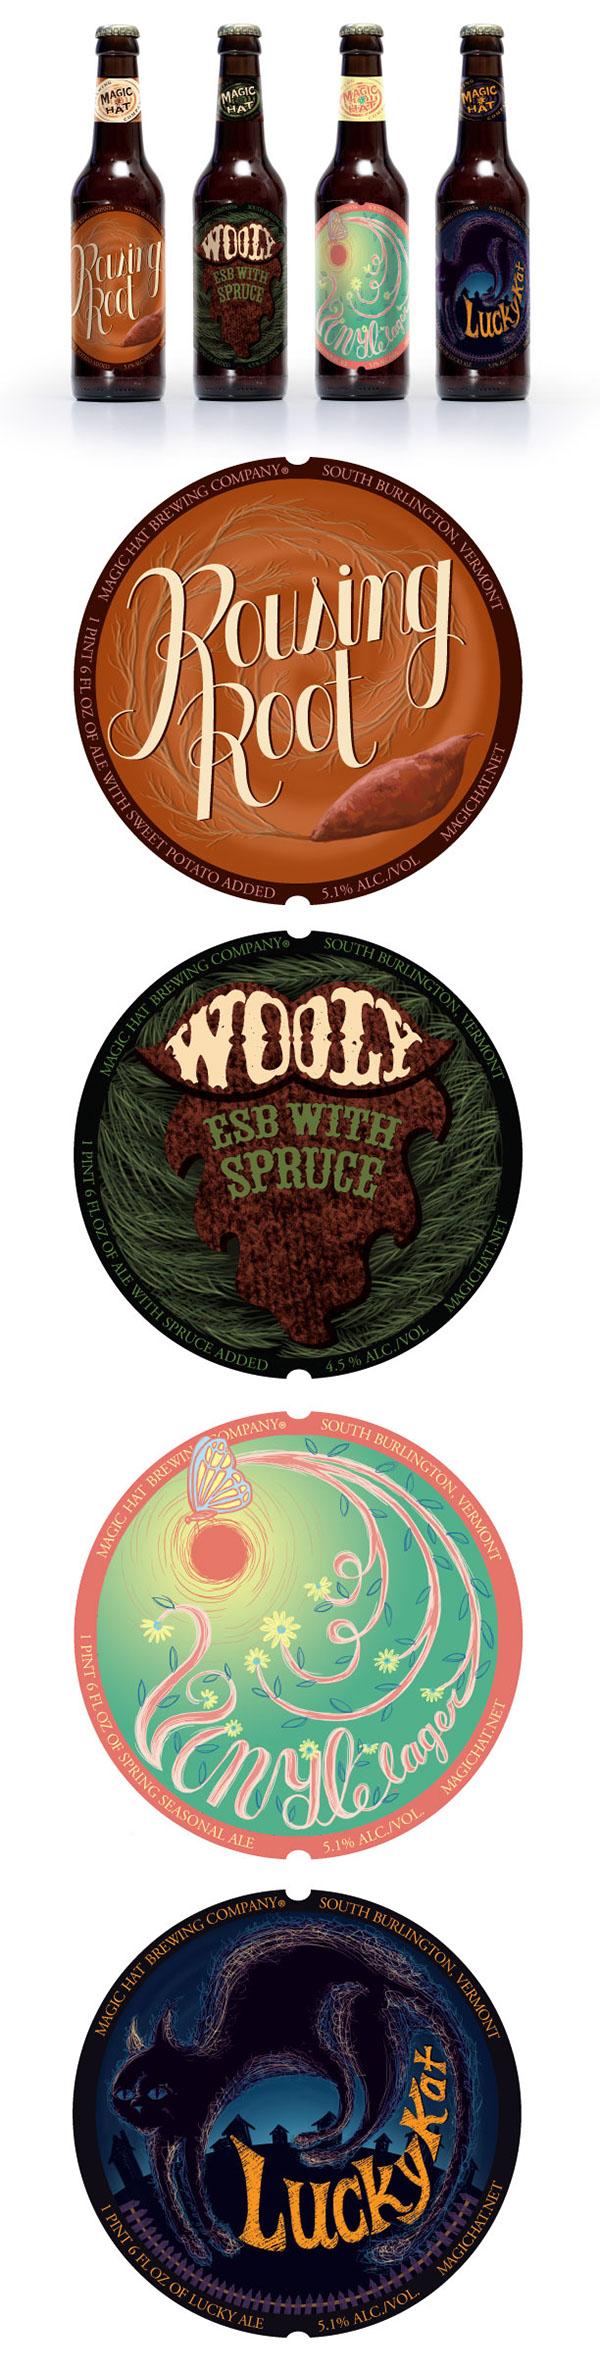 1e4fbc13207937.562747110187d  The 14 Coolest Beer Label Designs You've Ever Seen 1e4fbc13207937